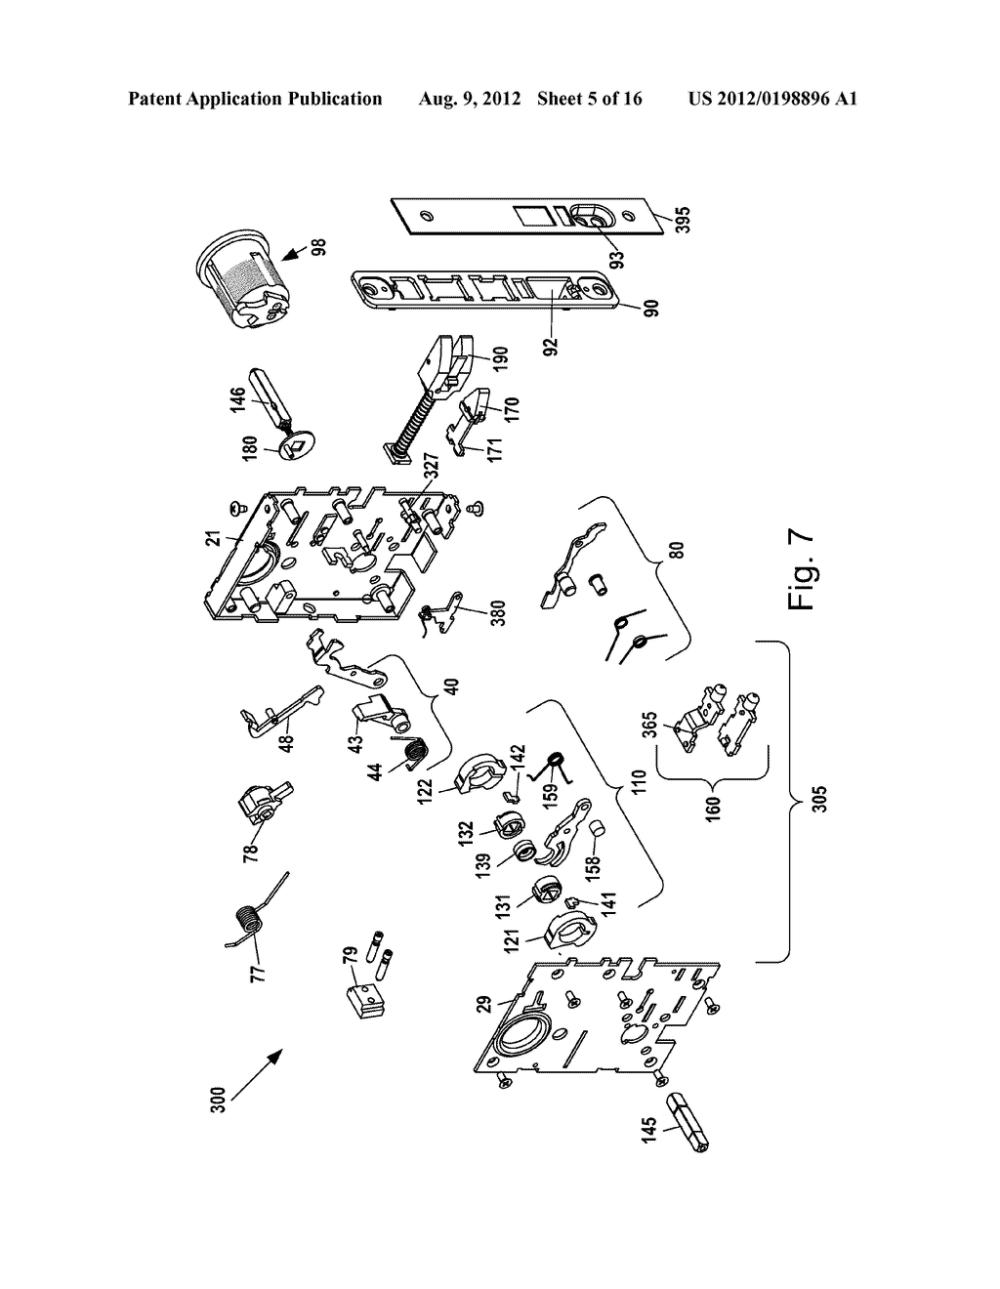 medium resolution of mortise lock assembly diagram schematic and image 06 mortise lock diagram mortise lock repair diagram